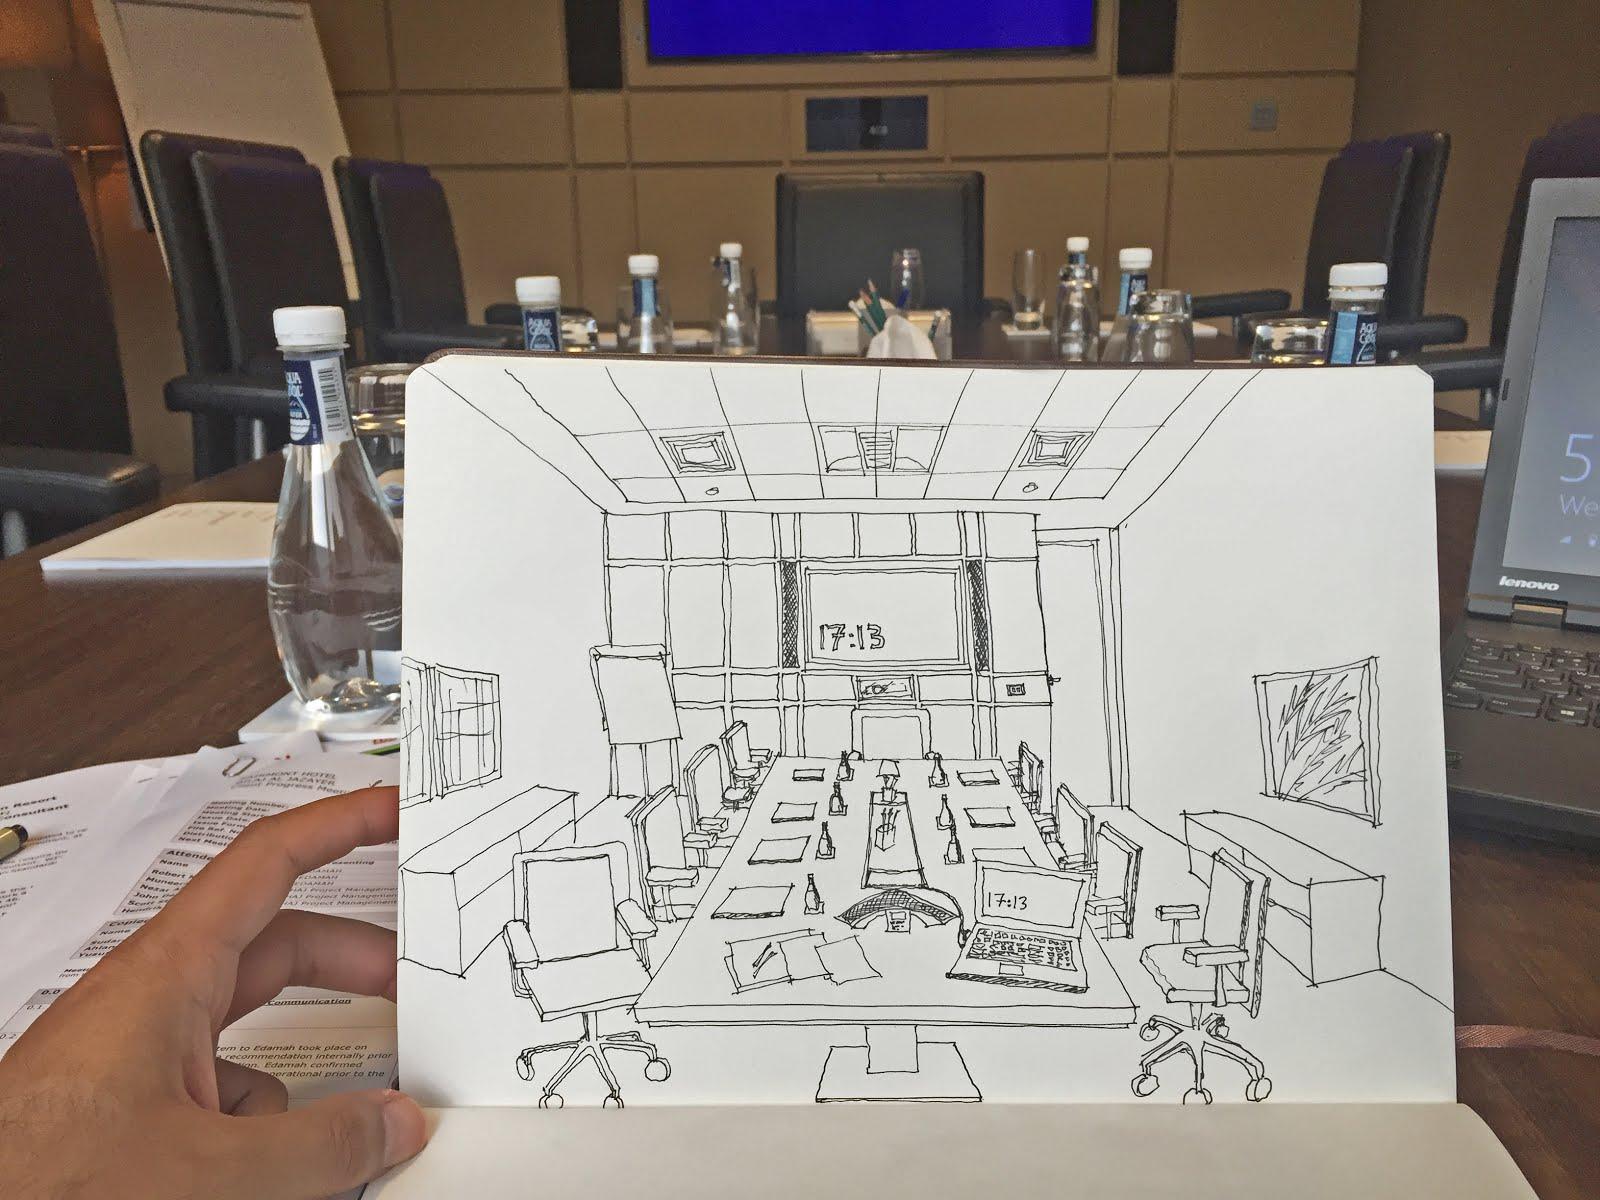 A Personal Online Sketchbook Desk Worke Sketch & Sketch A Room Online | New House Designs